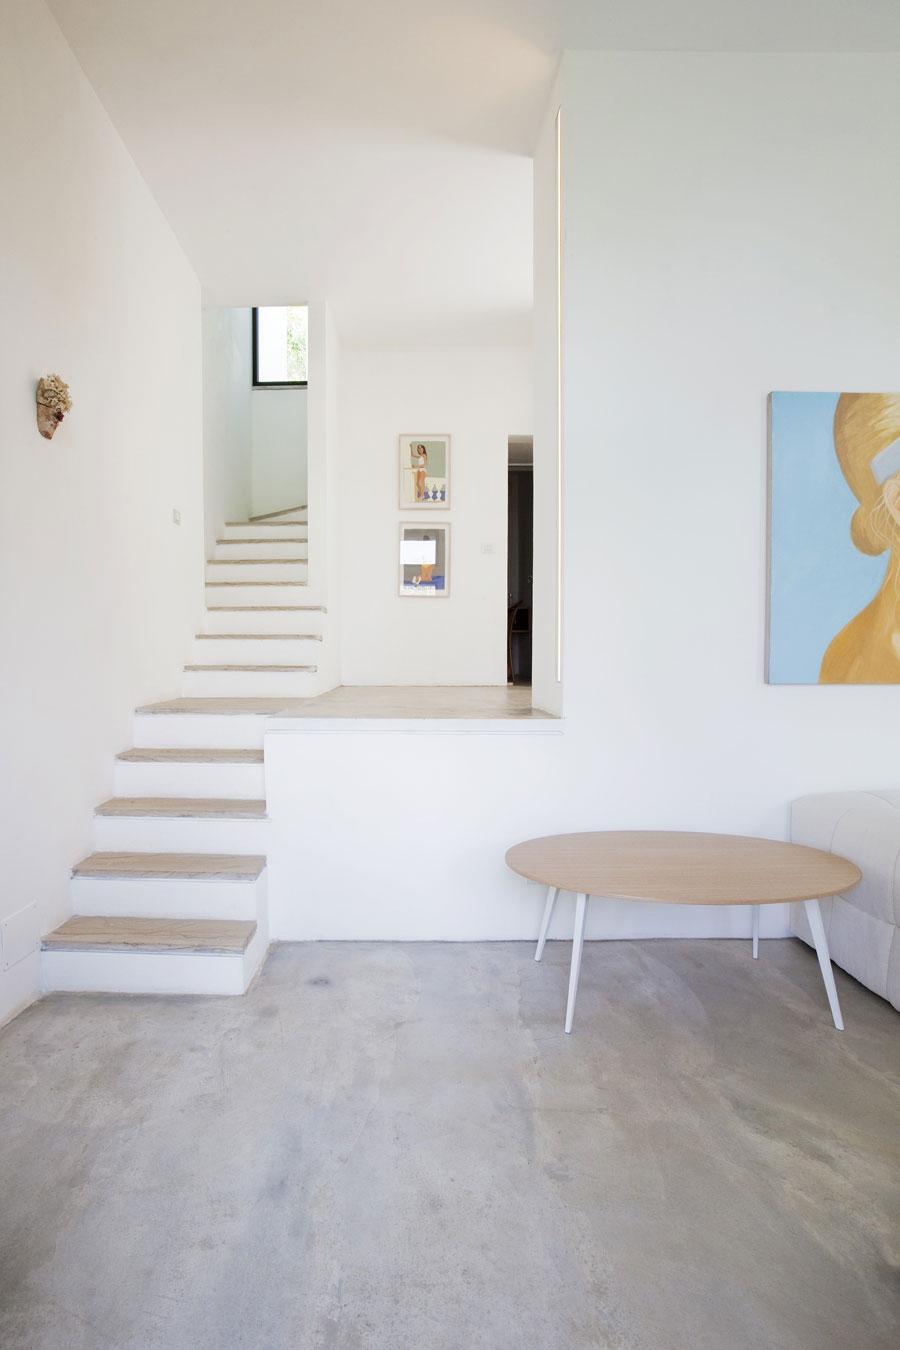 Rustic Staircase, Farmhouse in Riomaggiore, Italy by A2BC Architects and SibillAssociati